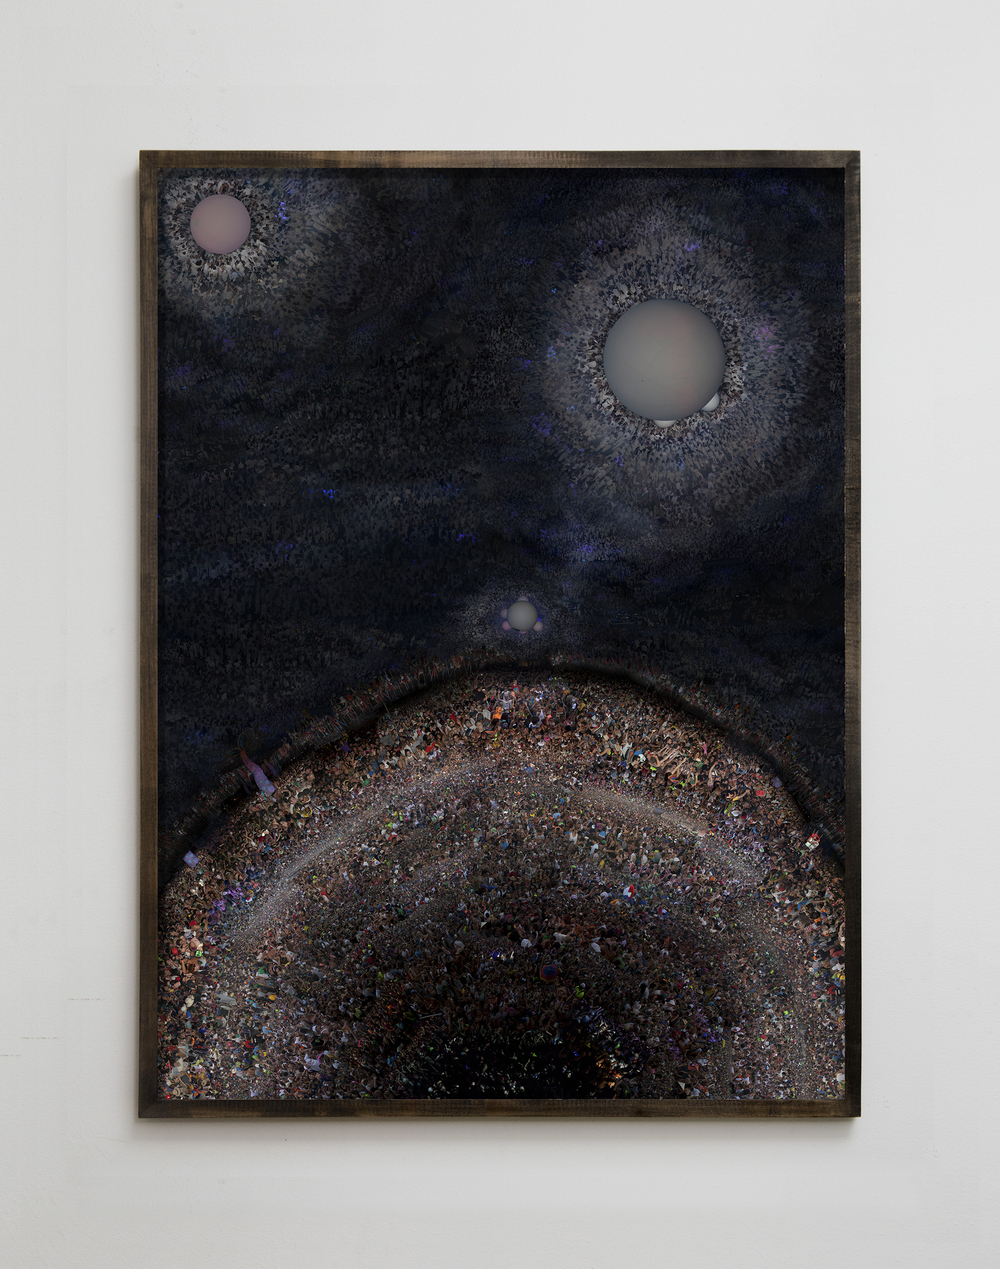 Untitled (New York, Monegros Desert) Digital C Print. 60x81 inches